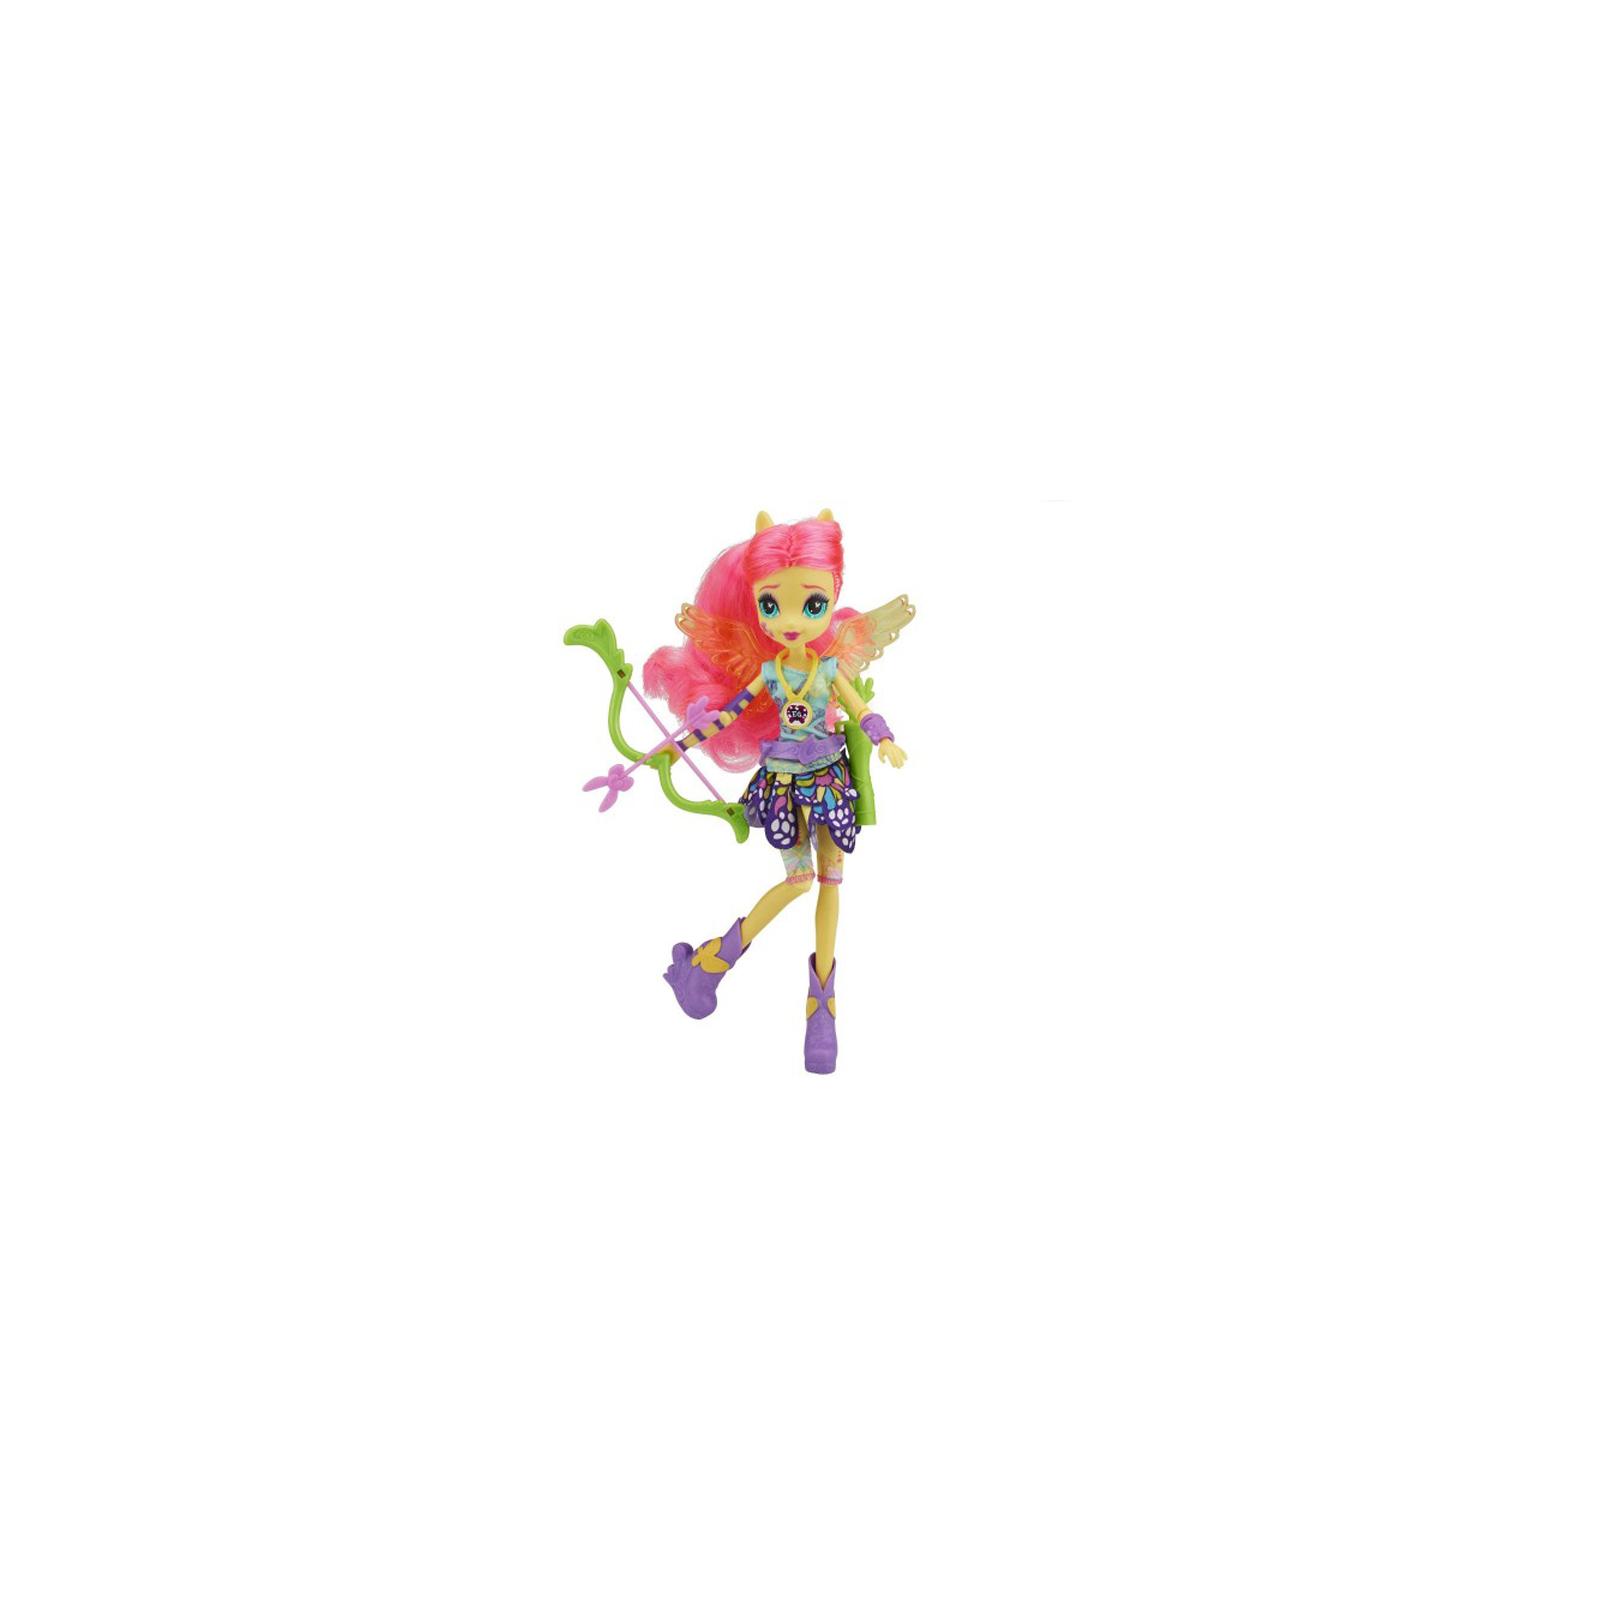 Кукла Hasbro My Little Pony Equestria Girls (B1771) изображение 11